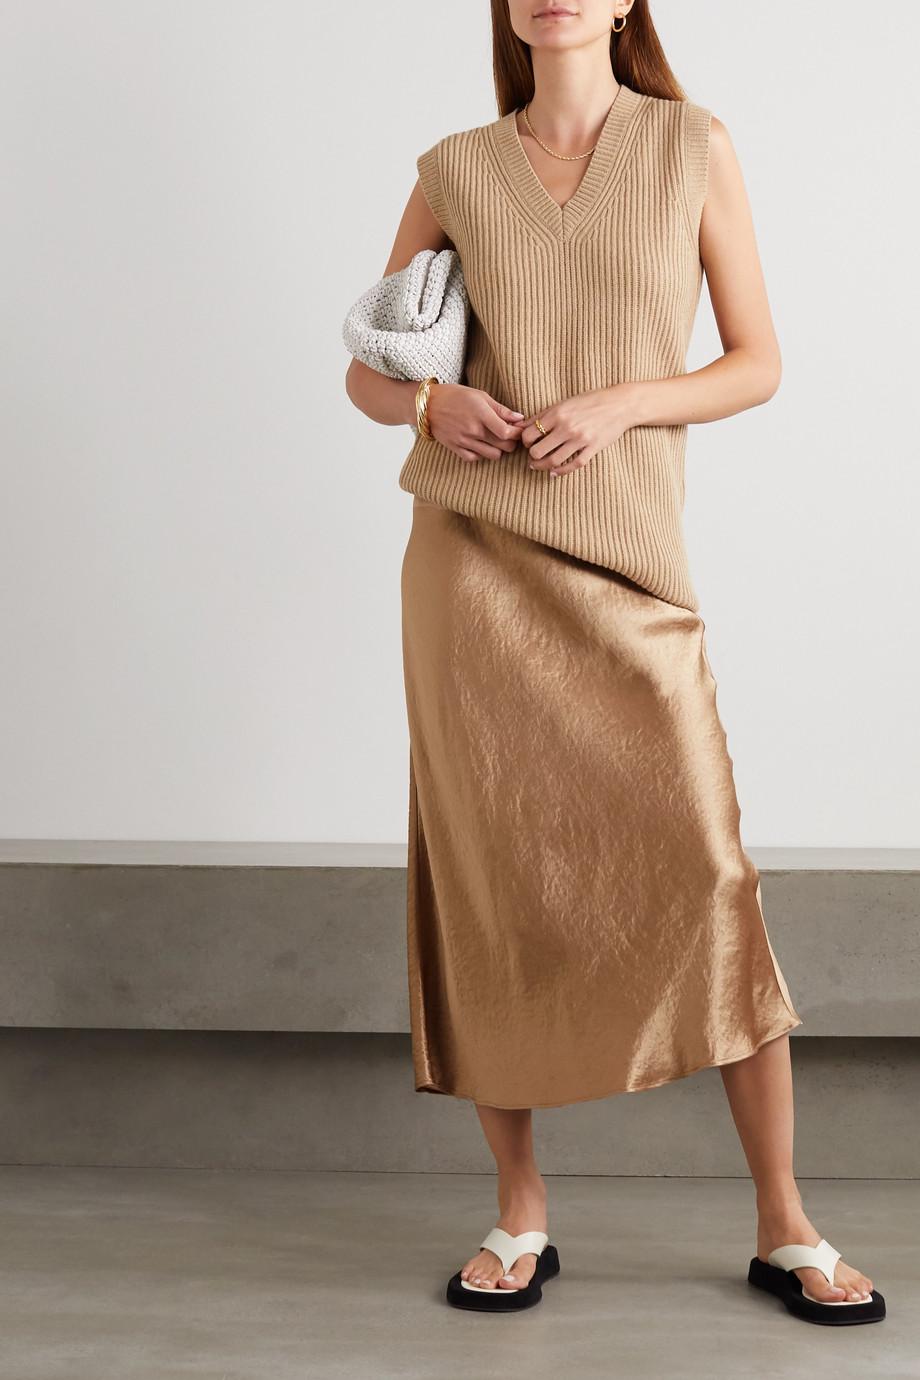 Max Mara Leisure 水洗缎布中长半身裙